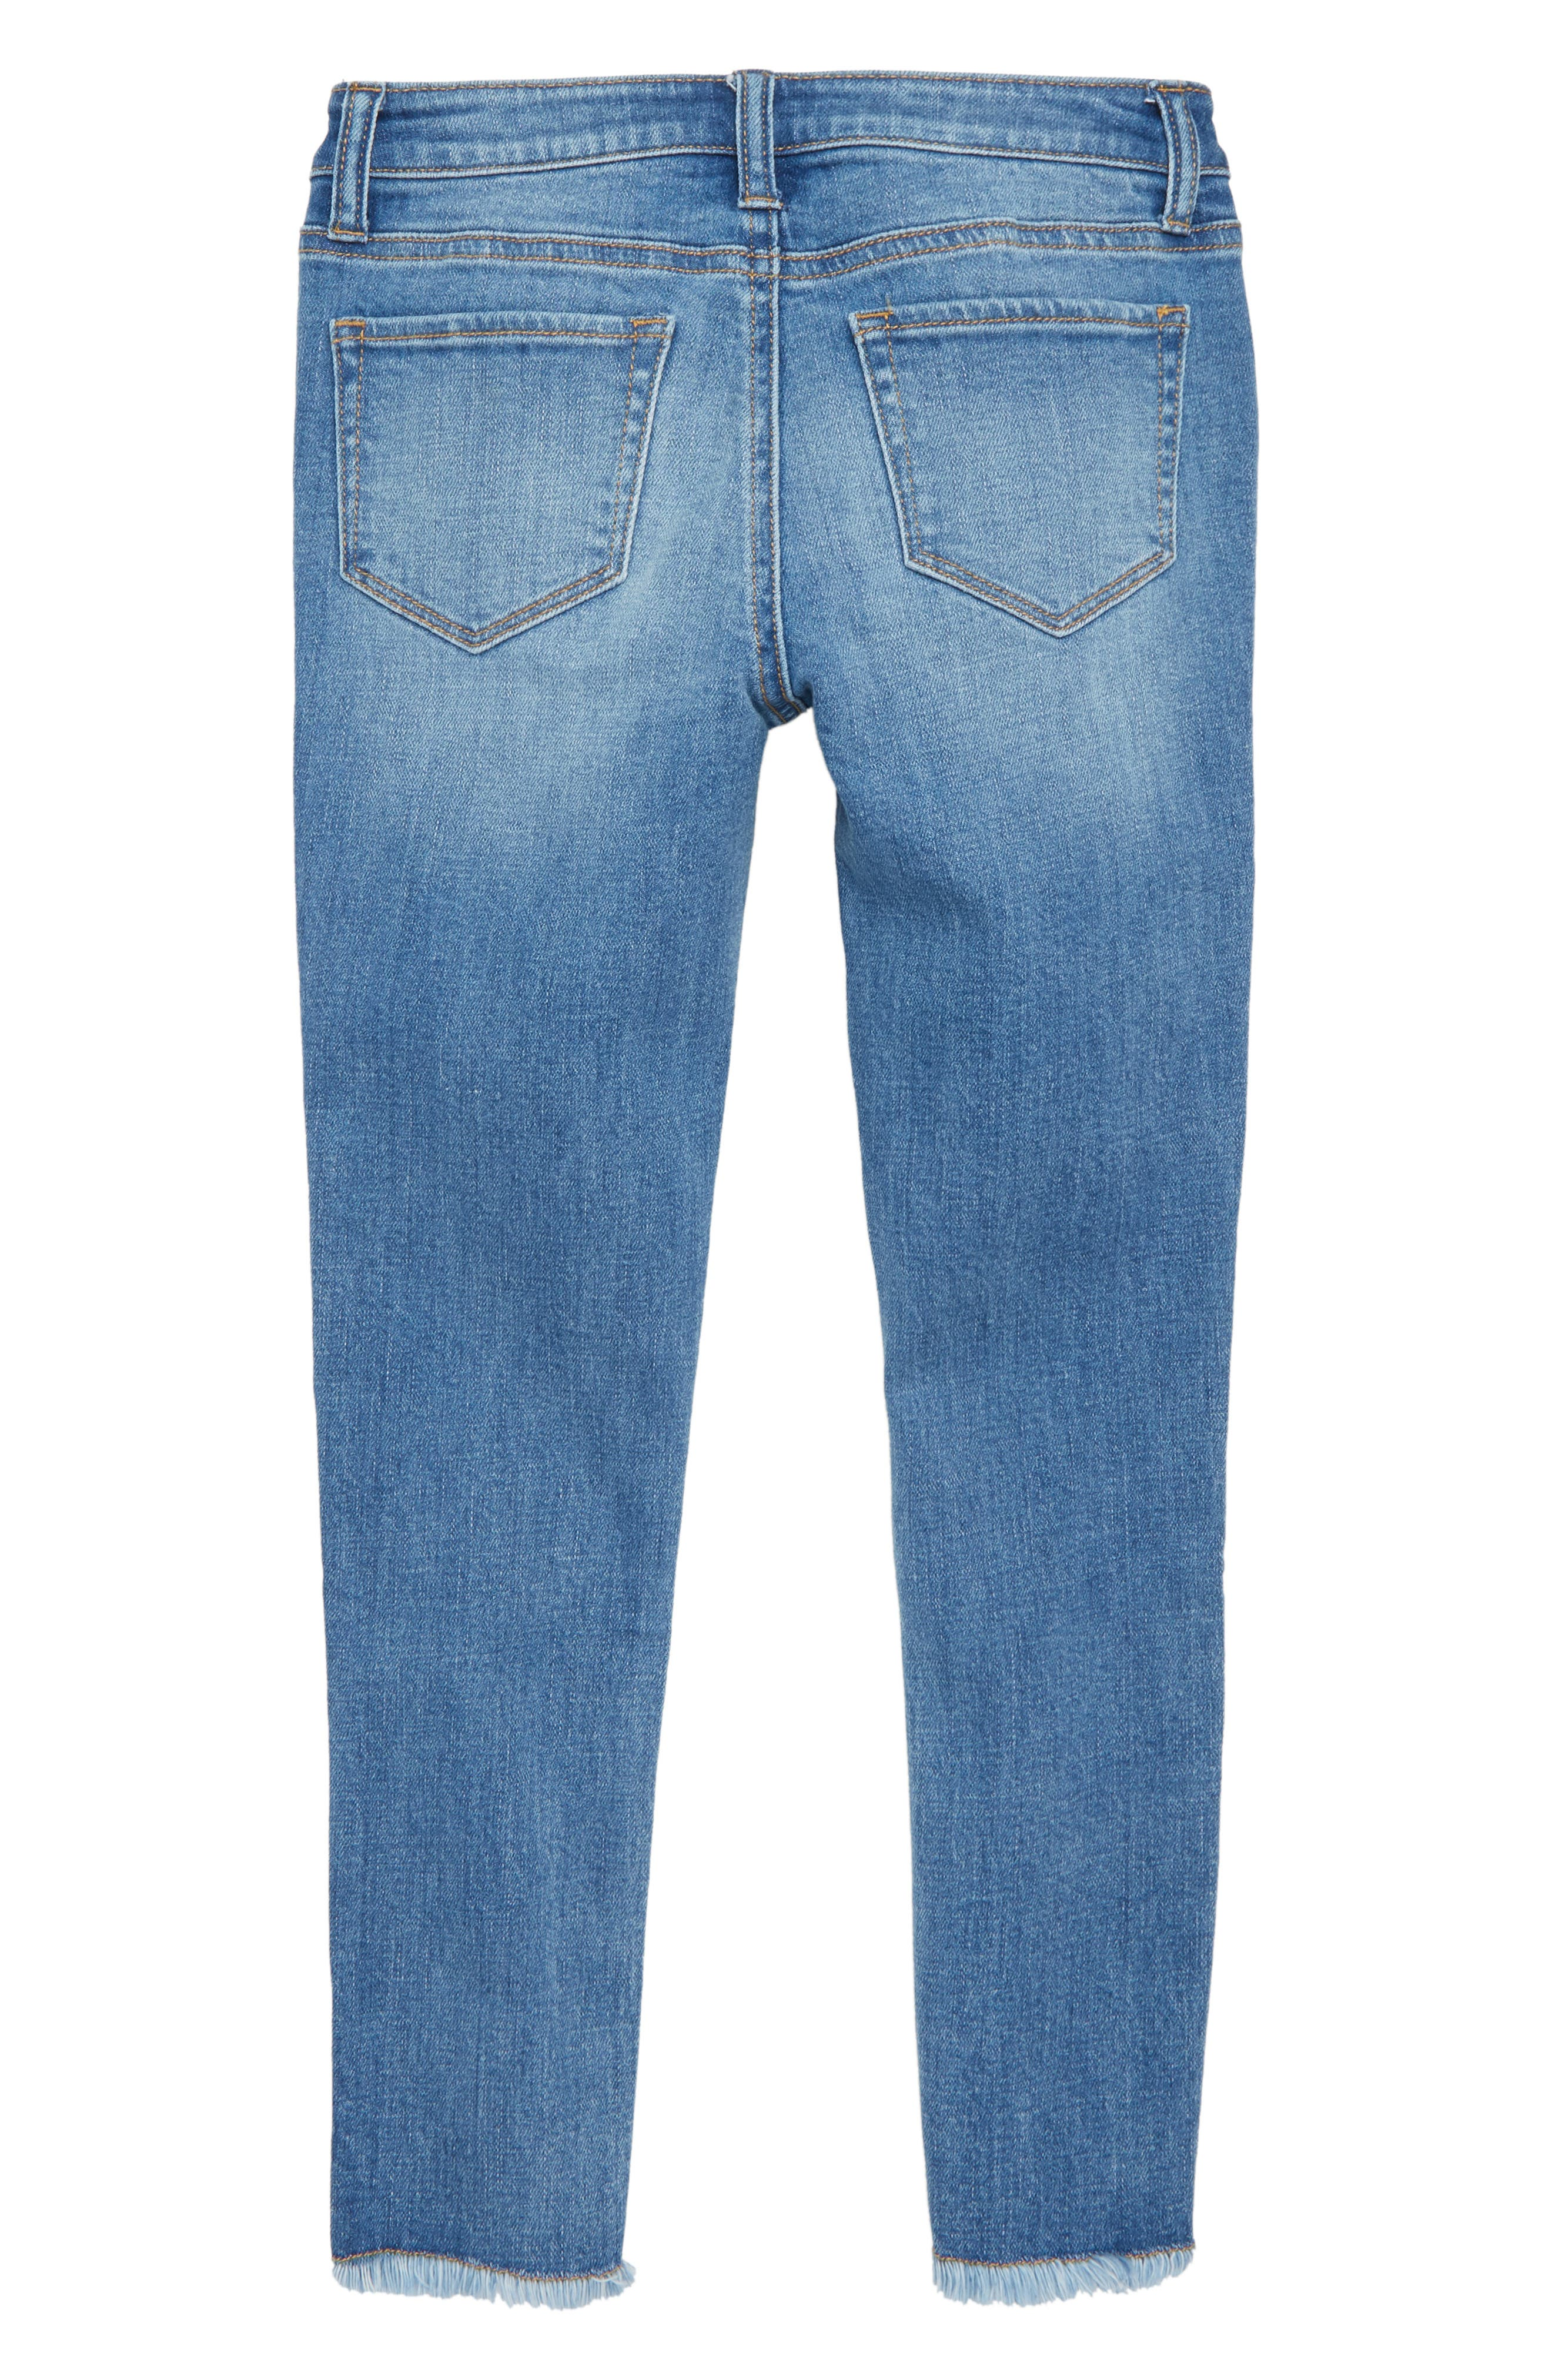 Embroidered Fray Hem Skinny Jeans,                             Alternate thumbnail 2, color,